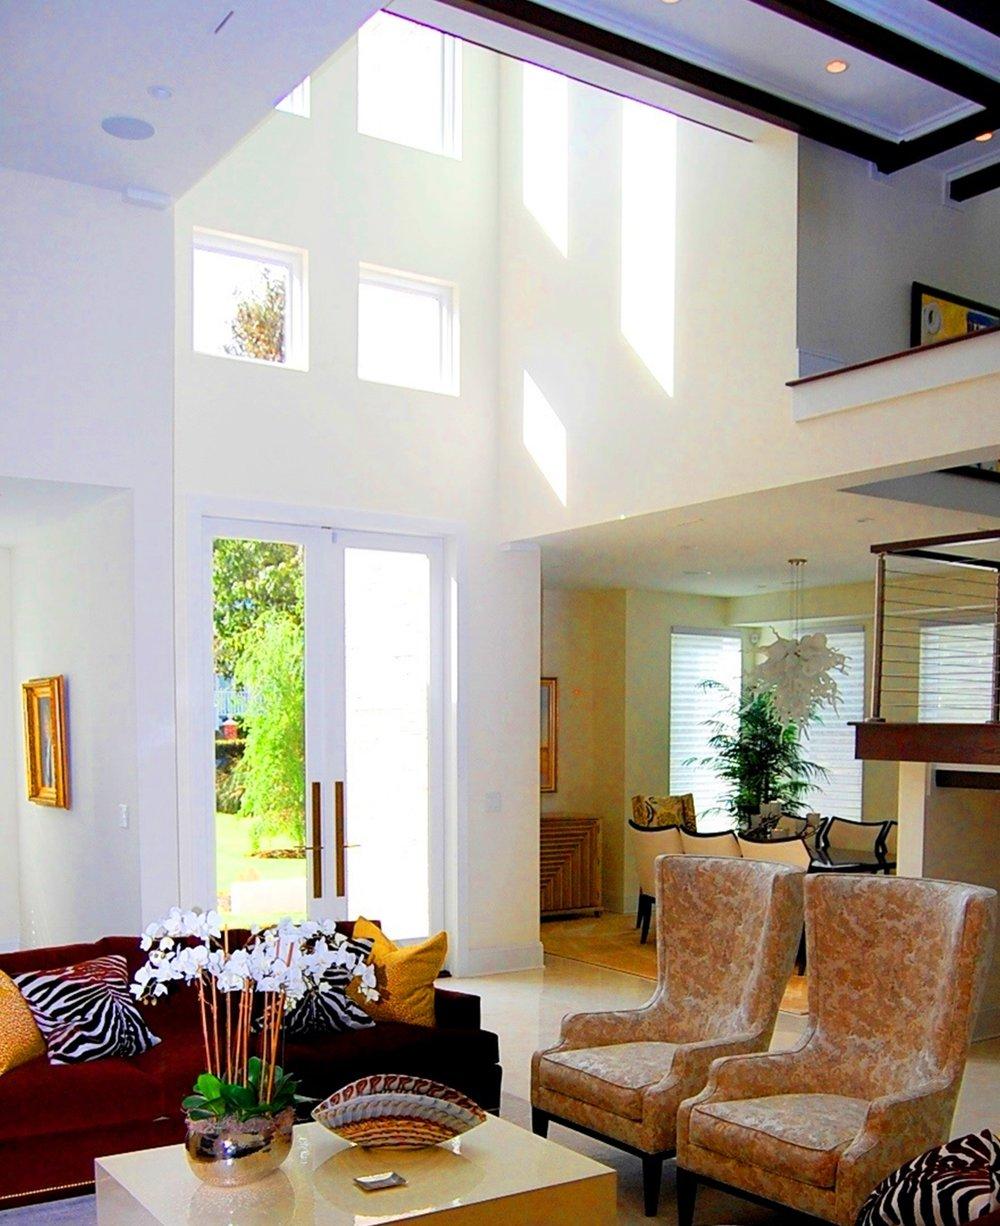 Resort Dream Home #residence#home#homebuilder#virginiabeach#architect#architecture#vacation#sanctuary#waterfront#beachfront